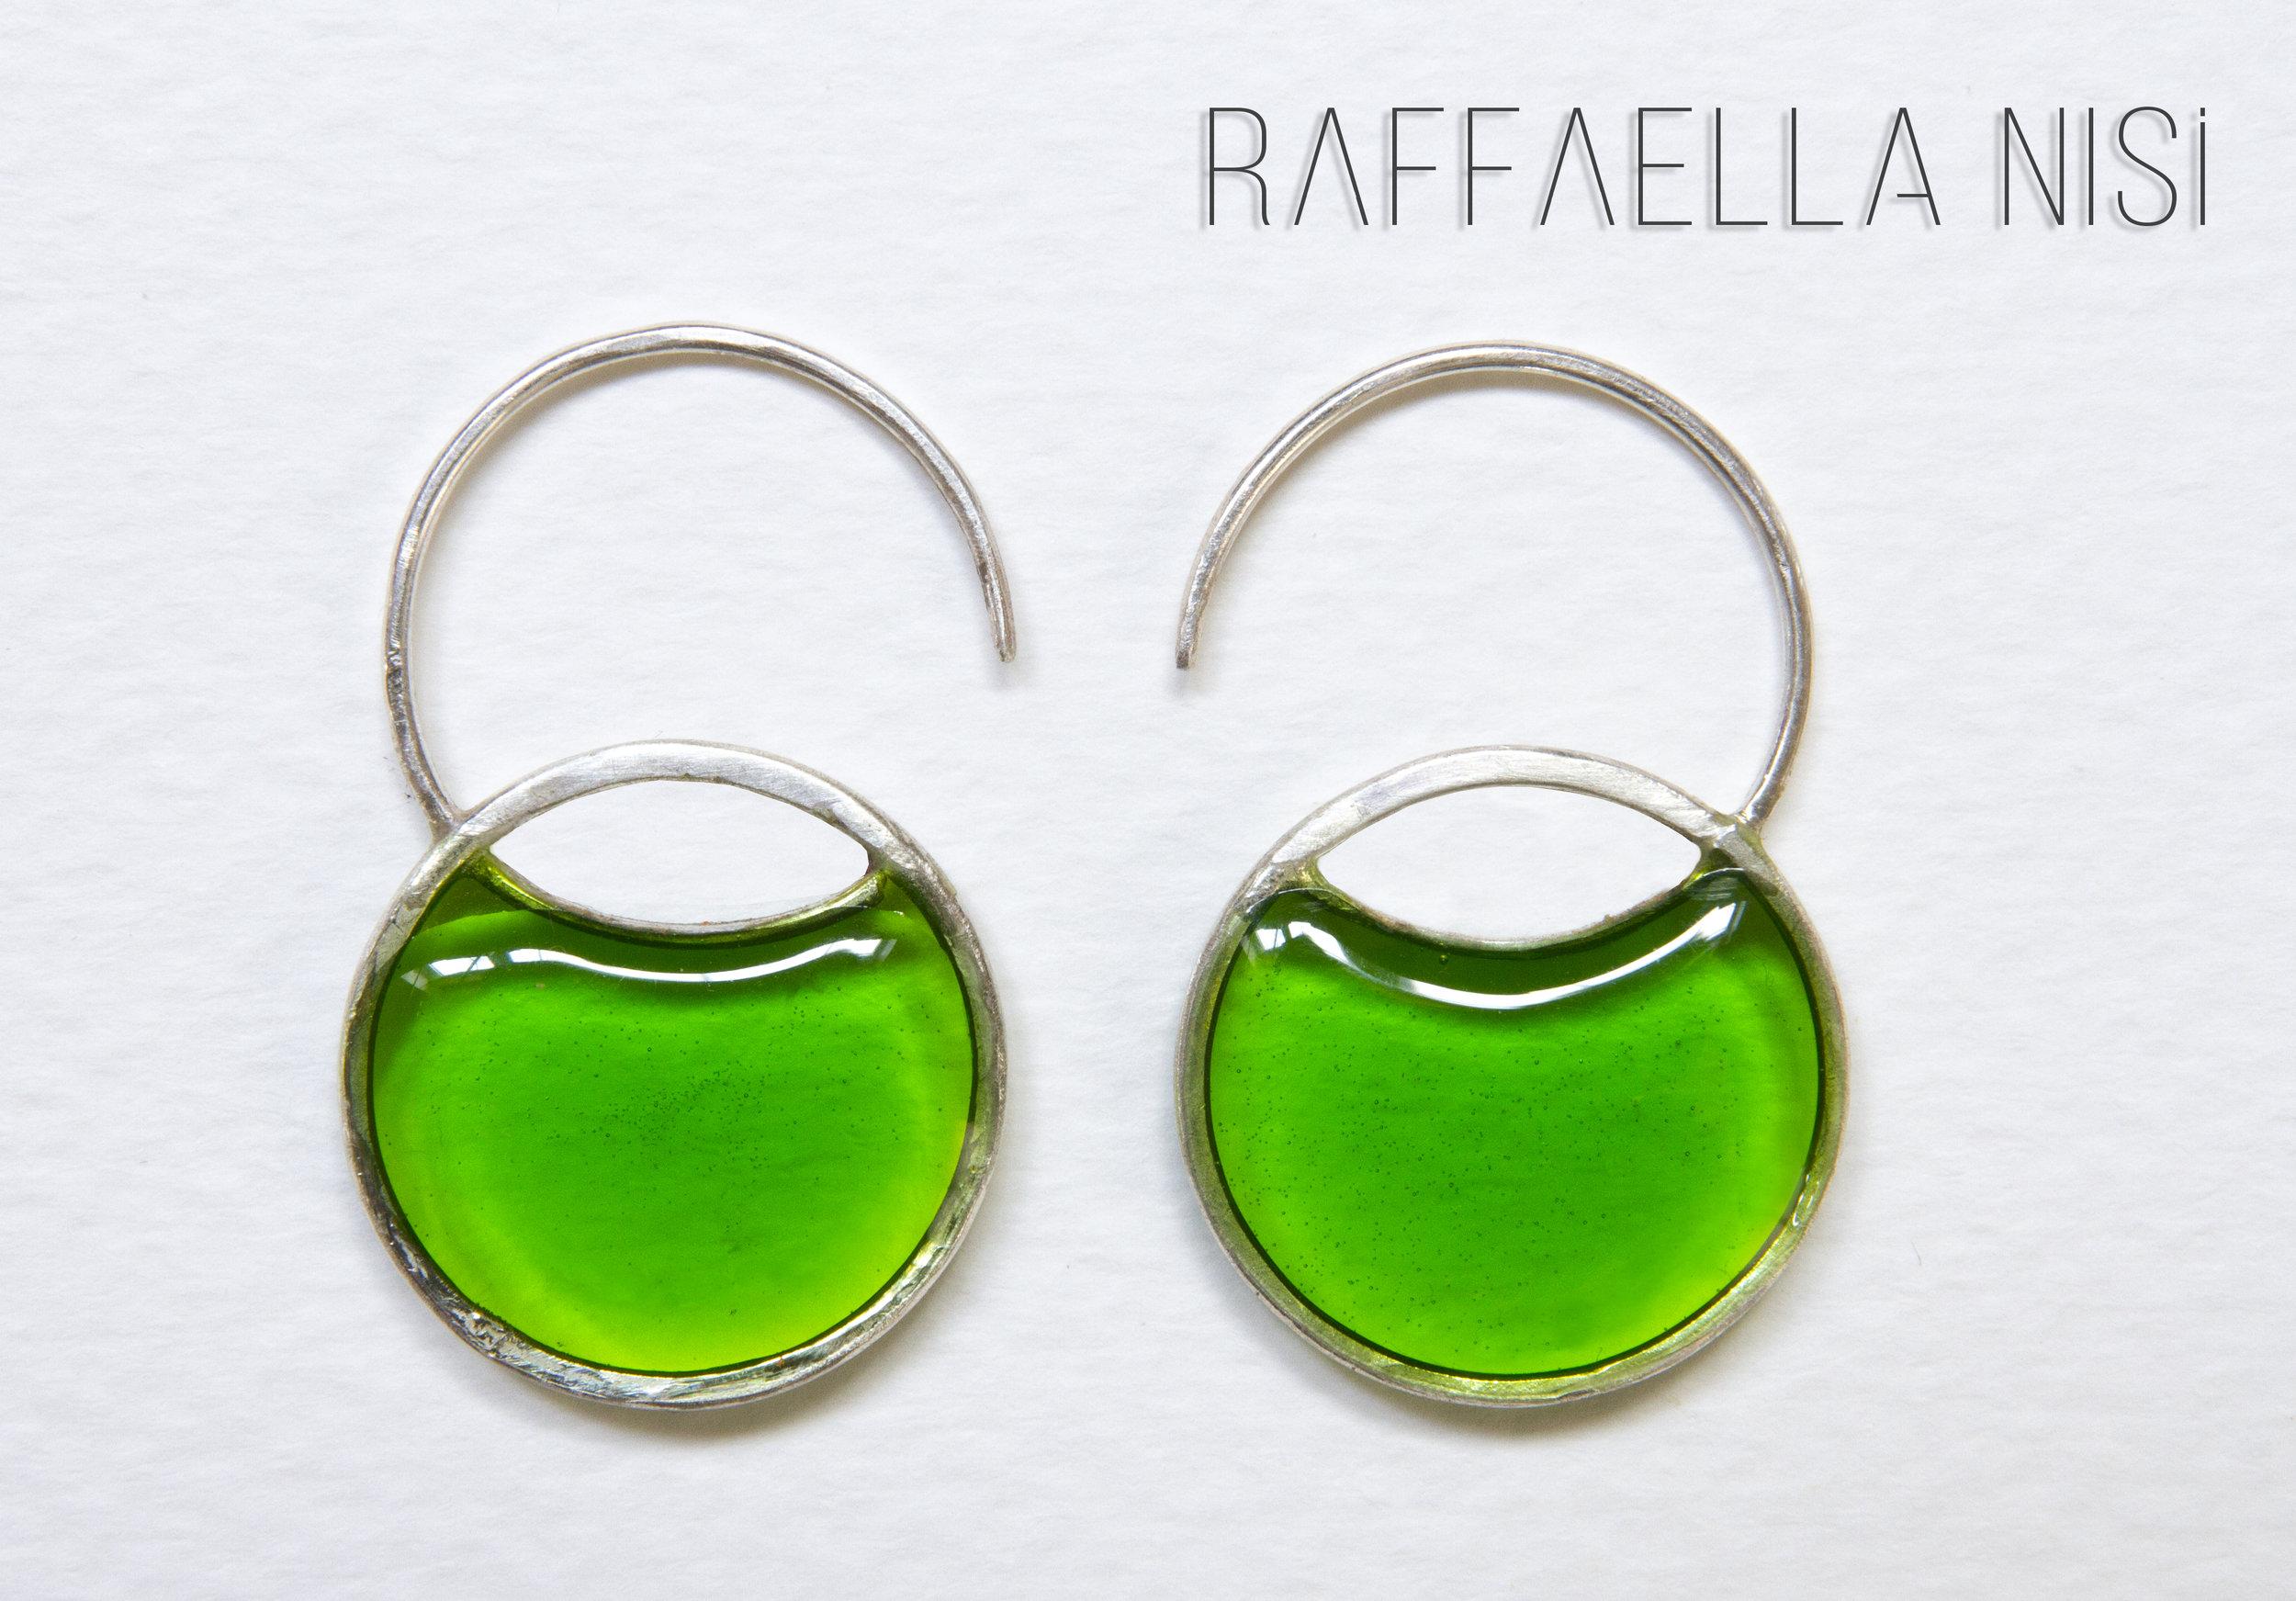 Raffaella Nisi